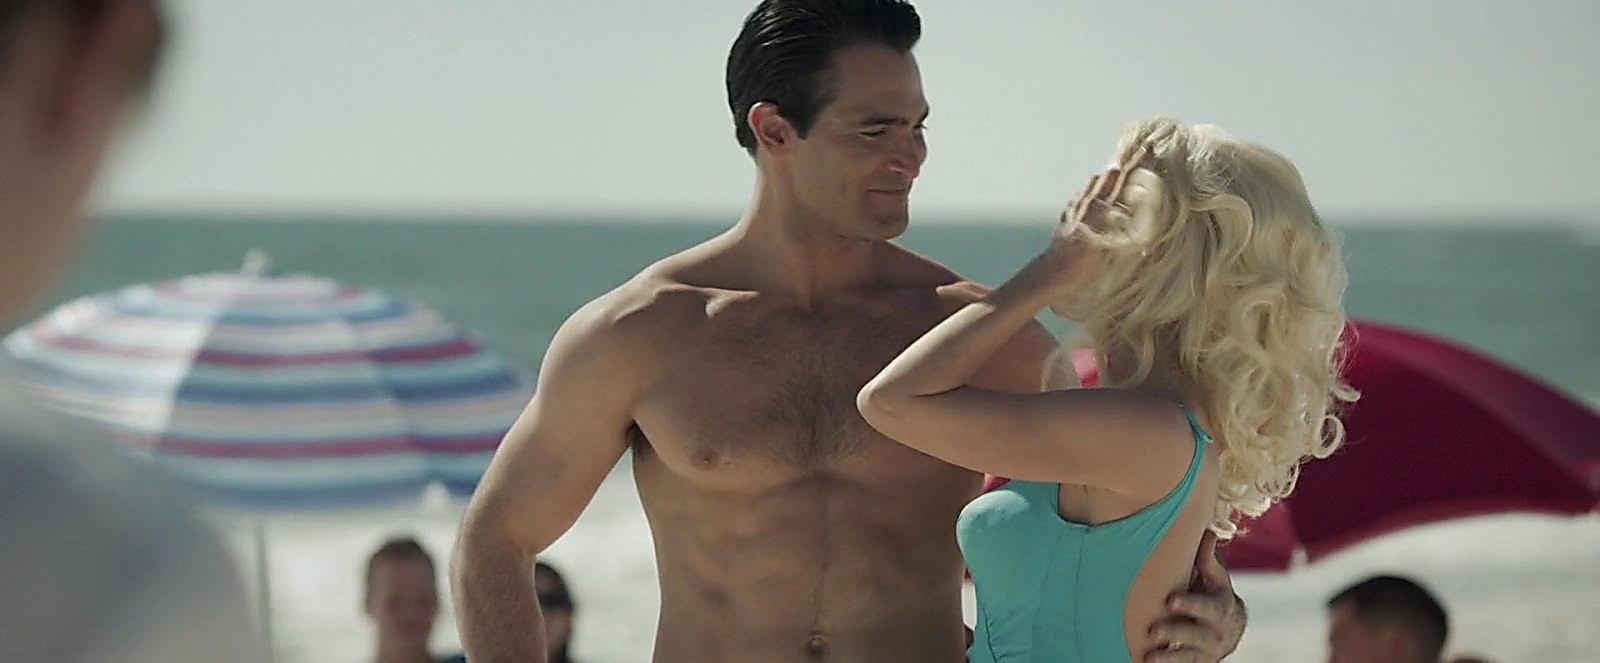 Tyler Hoechlin sexy shirtless scene January 15, 2019, 1pm